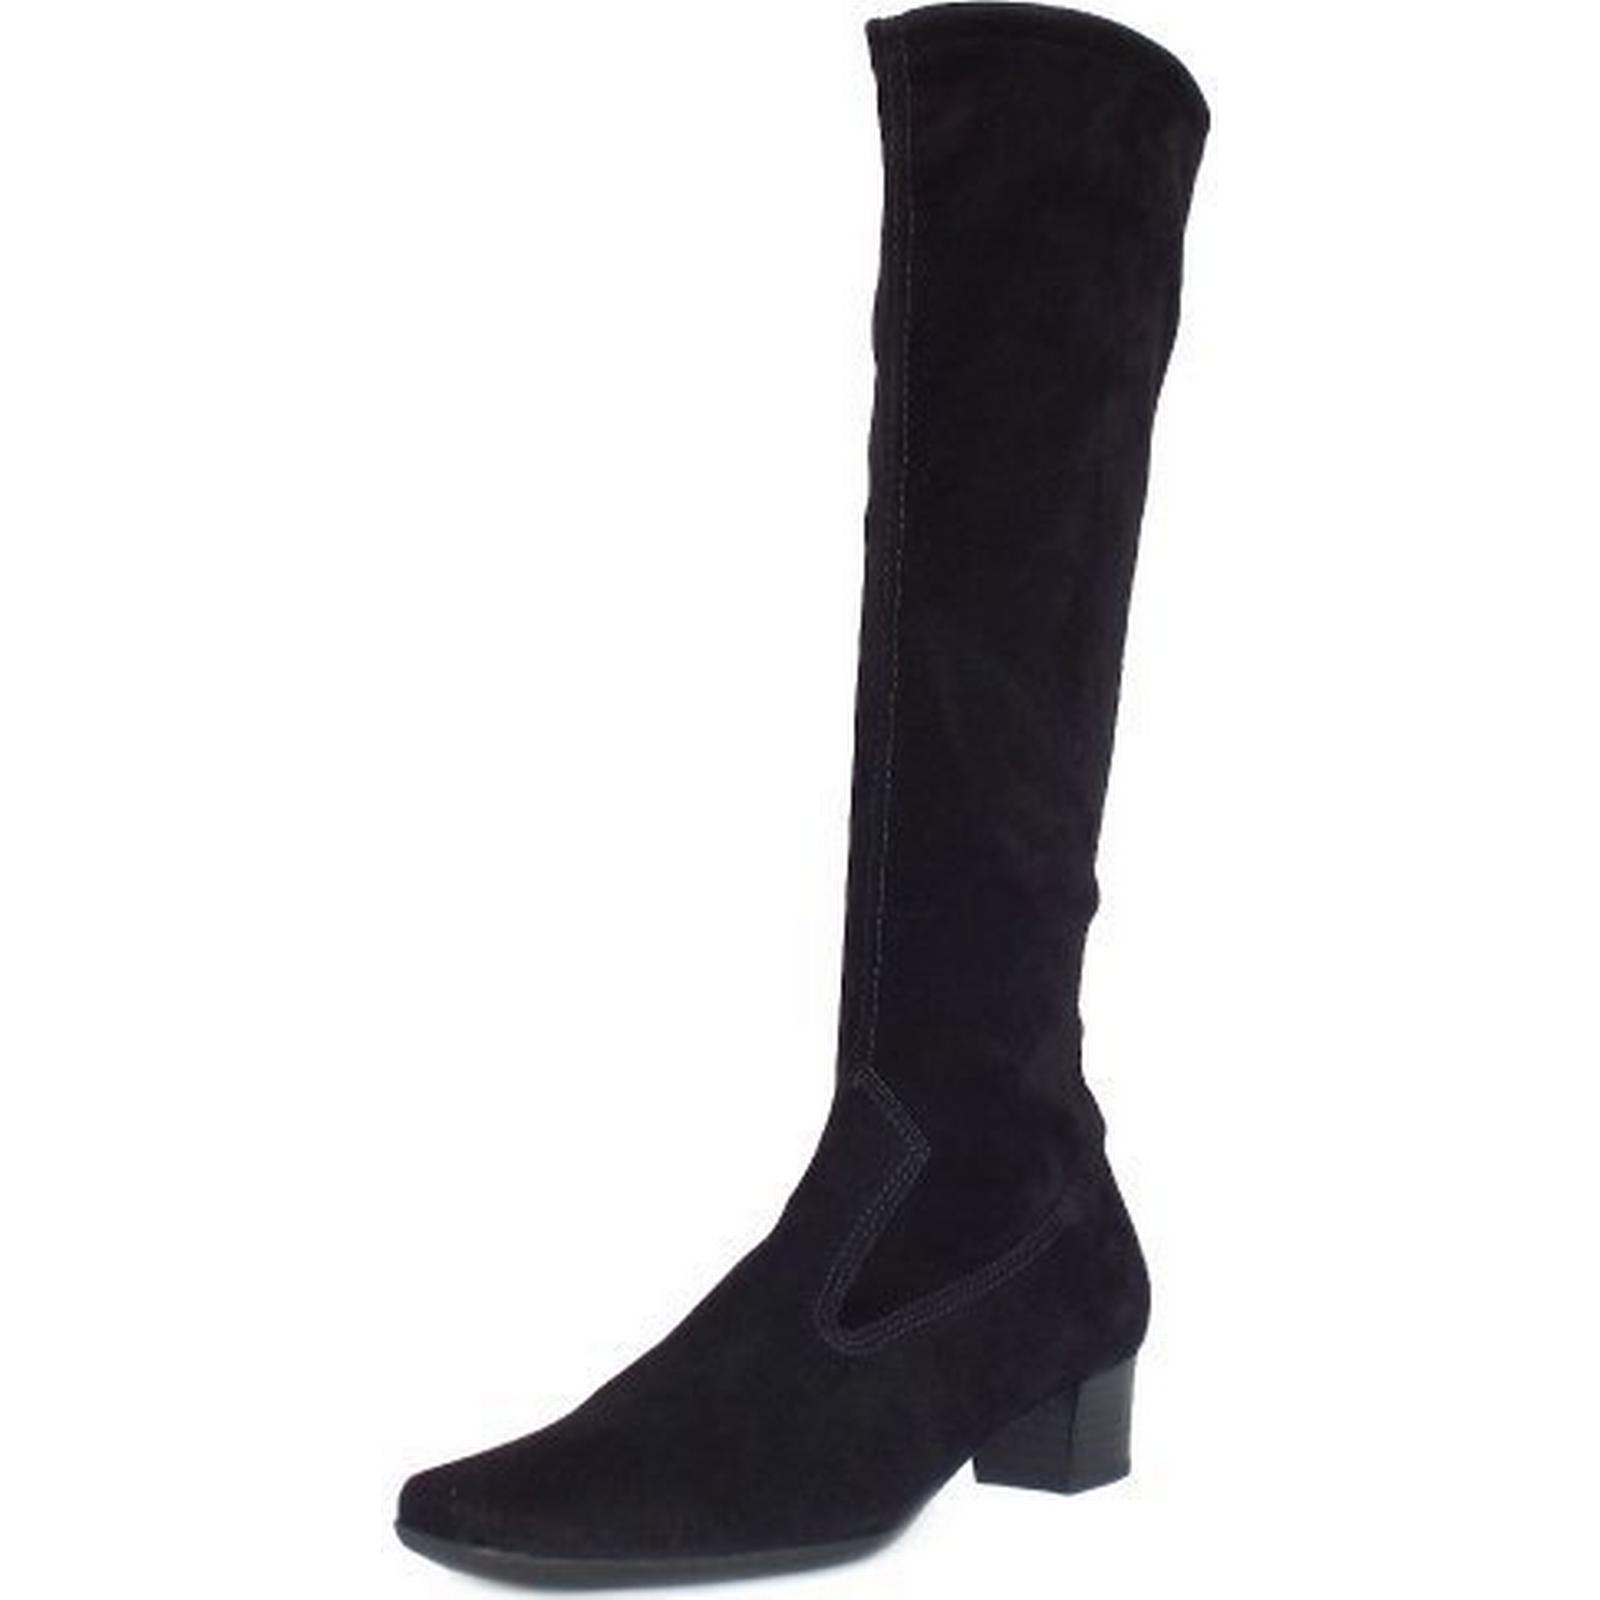 peter kaiser taille: aila peter kaiser mesdames de longues bottes taille: kaiser 3, couleur: blac 1b93aa